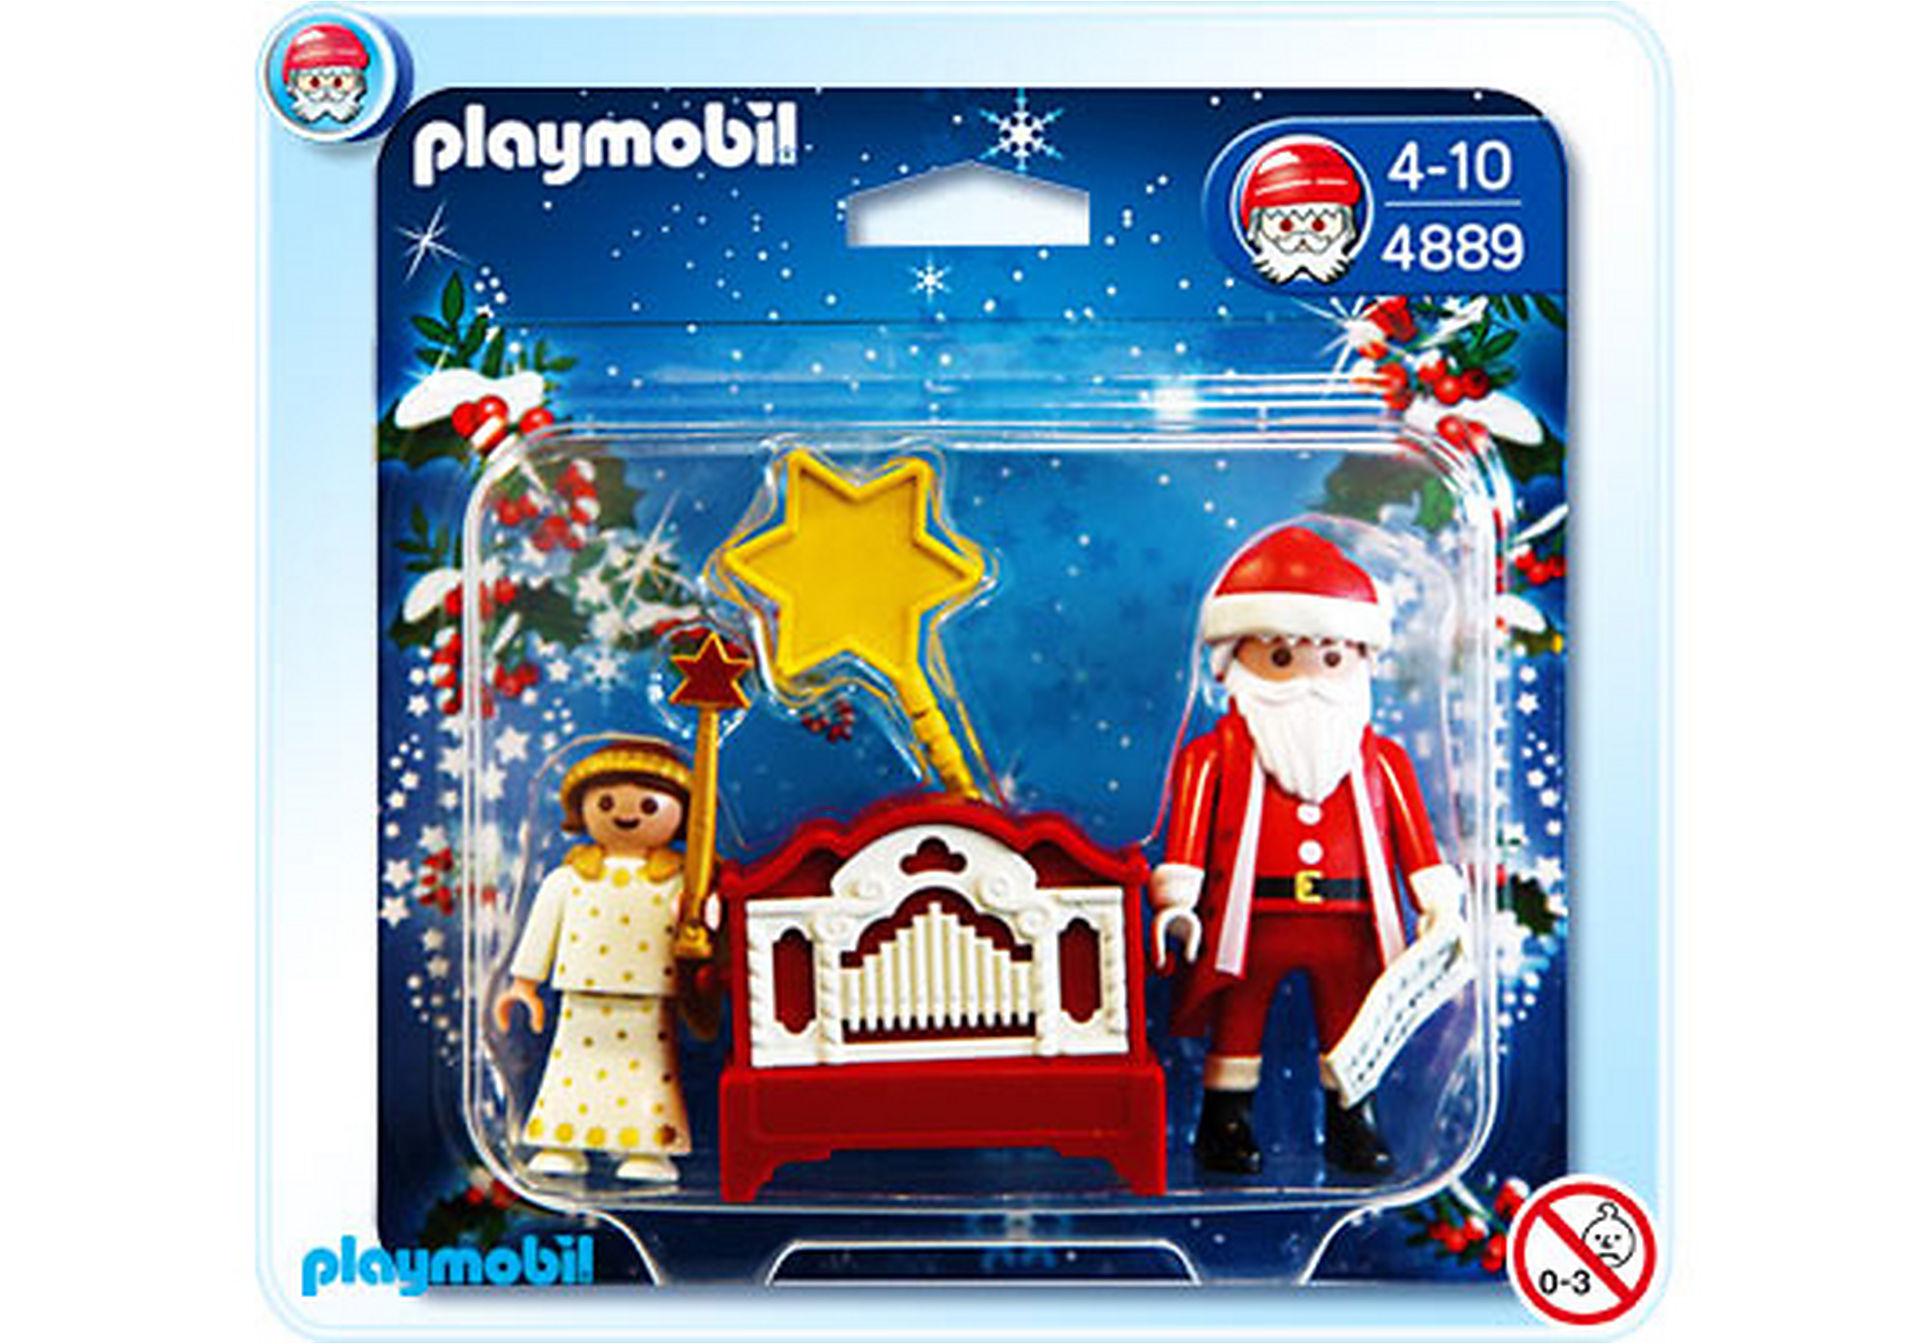 http://media.playmobil.com/i/playmobil/4889-A_product_detail/Engelchen mit Nikolaus und Leierkasten